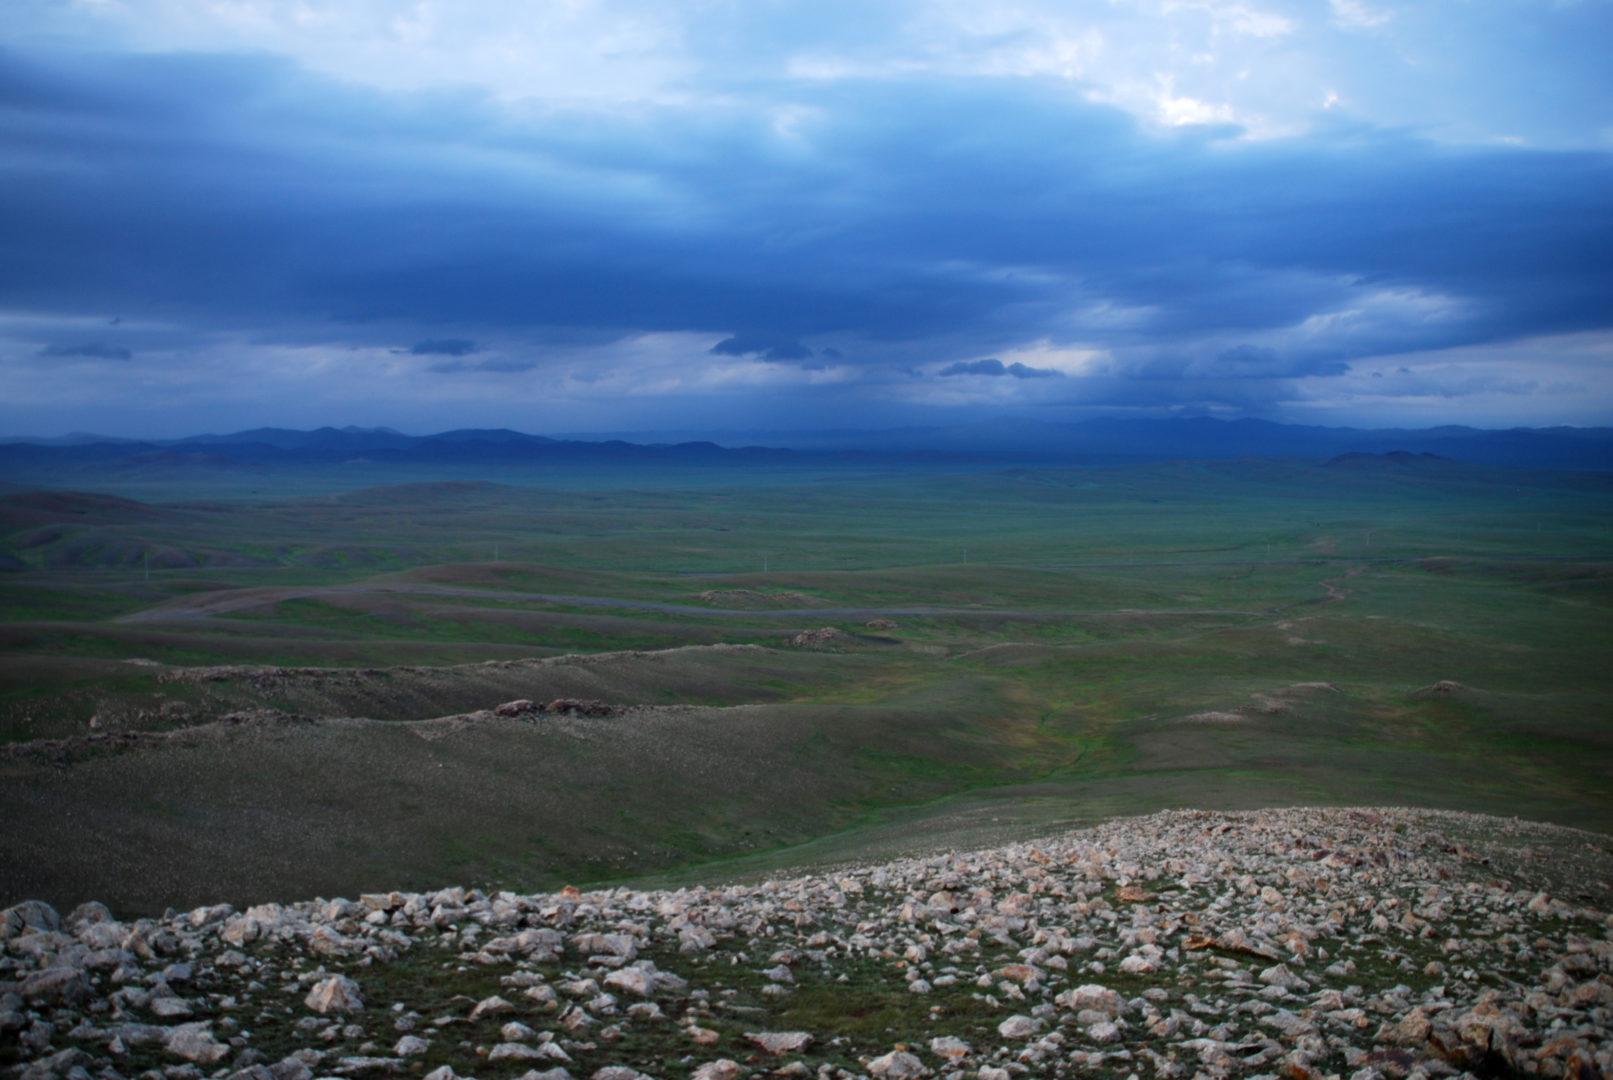 Endlose Steppe